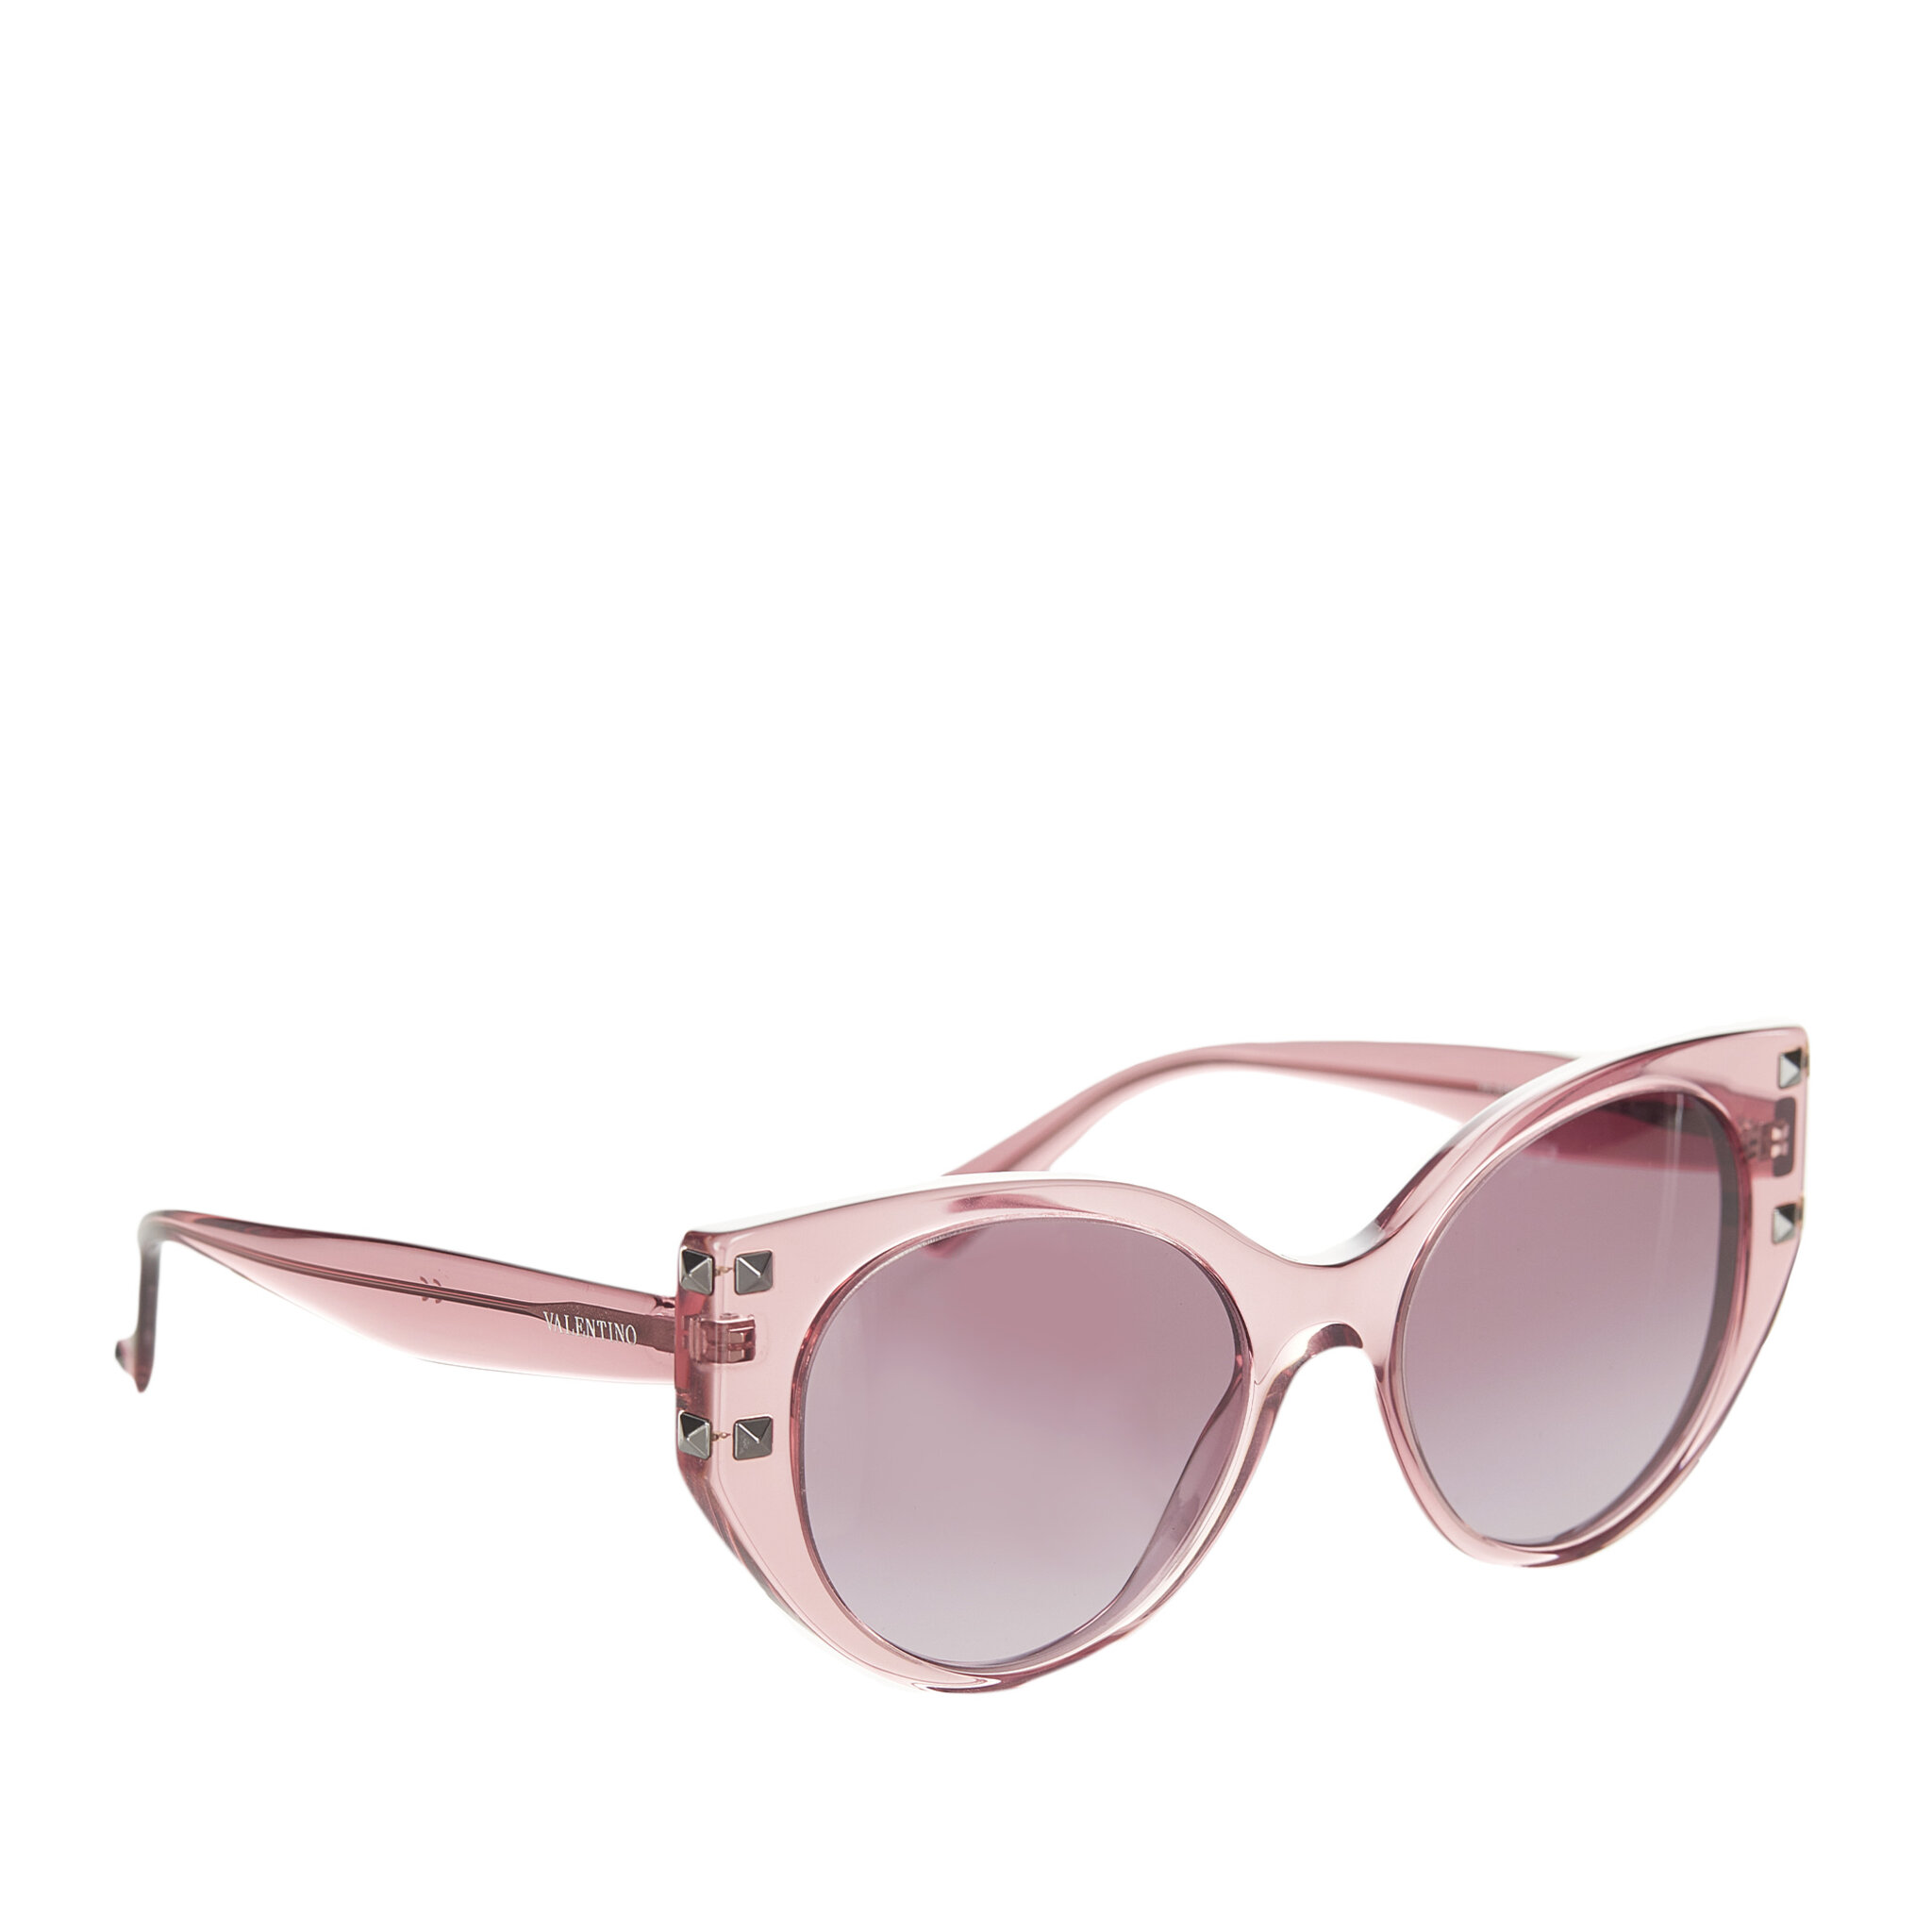 Valentino Rockstud Cat Eye Tinted Sunglasses, ONESIZE